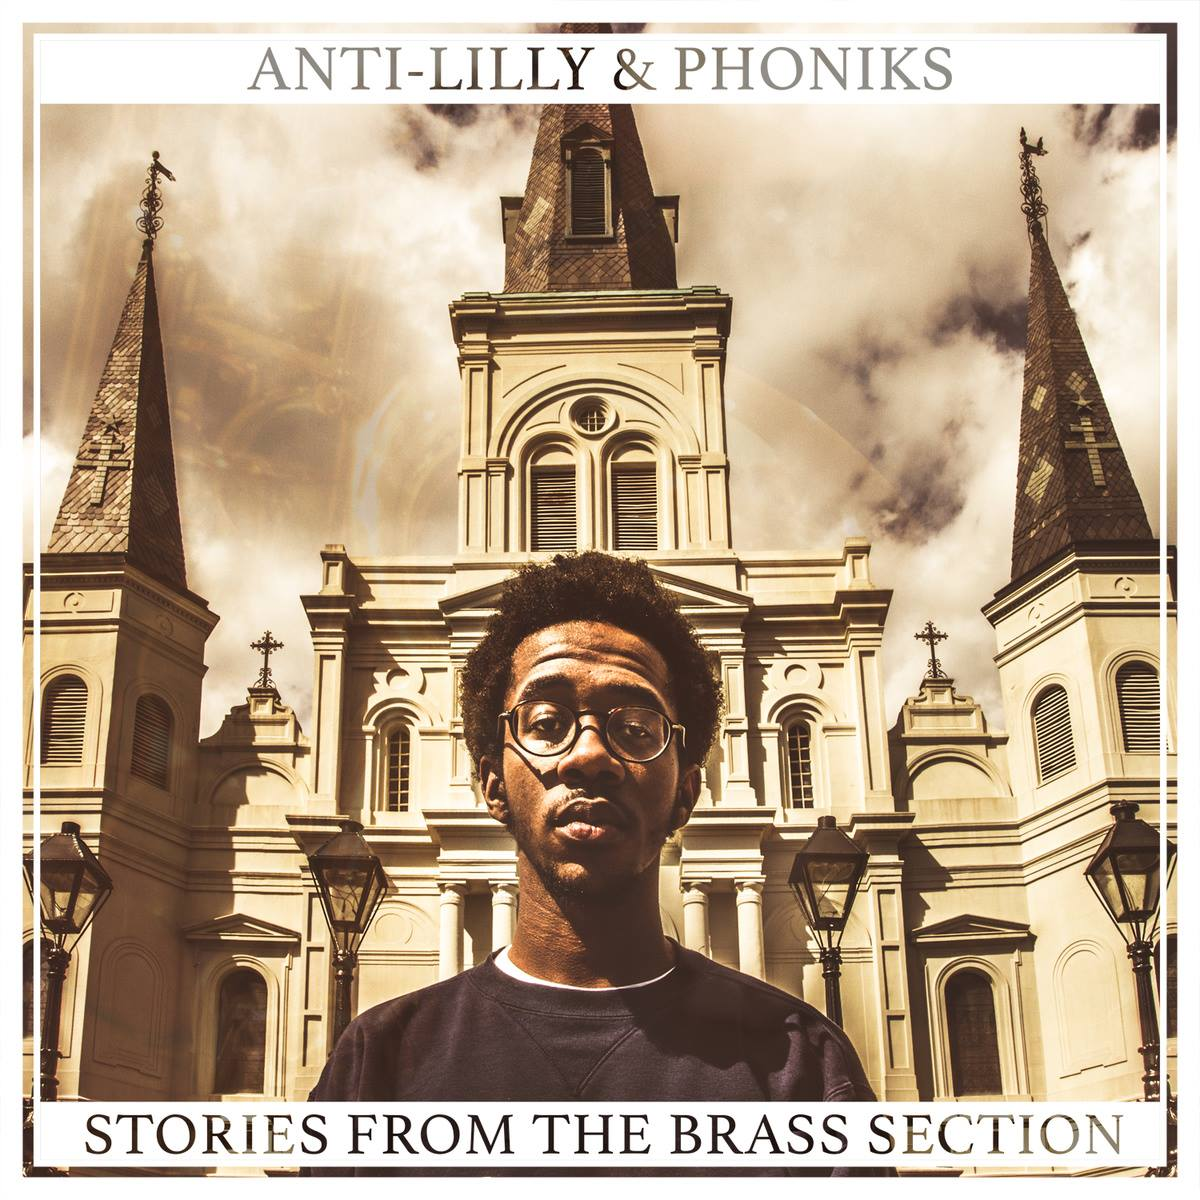 antililly&phoniks